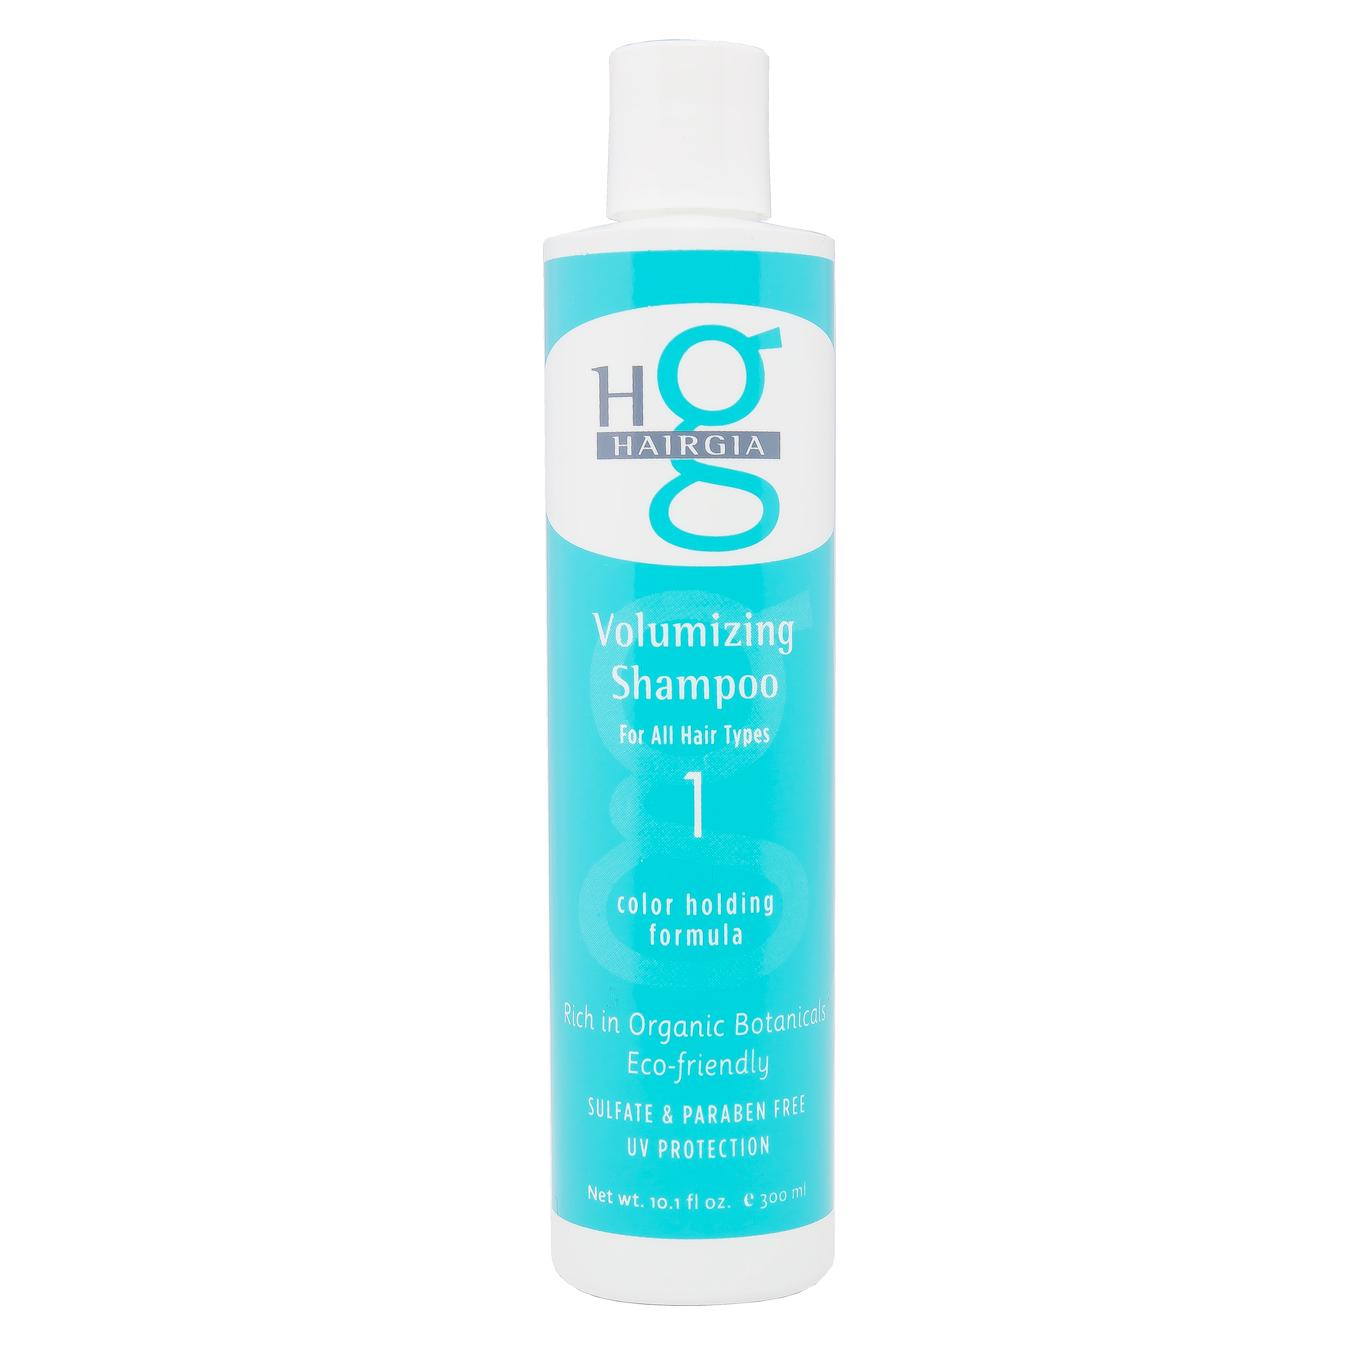 volumizing shampoo 1 19 00 40 00 hairgia volumizing shampoo 1 has been ...